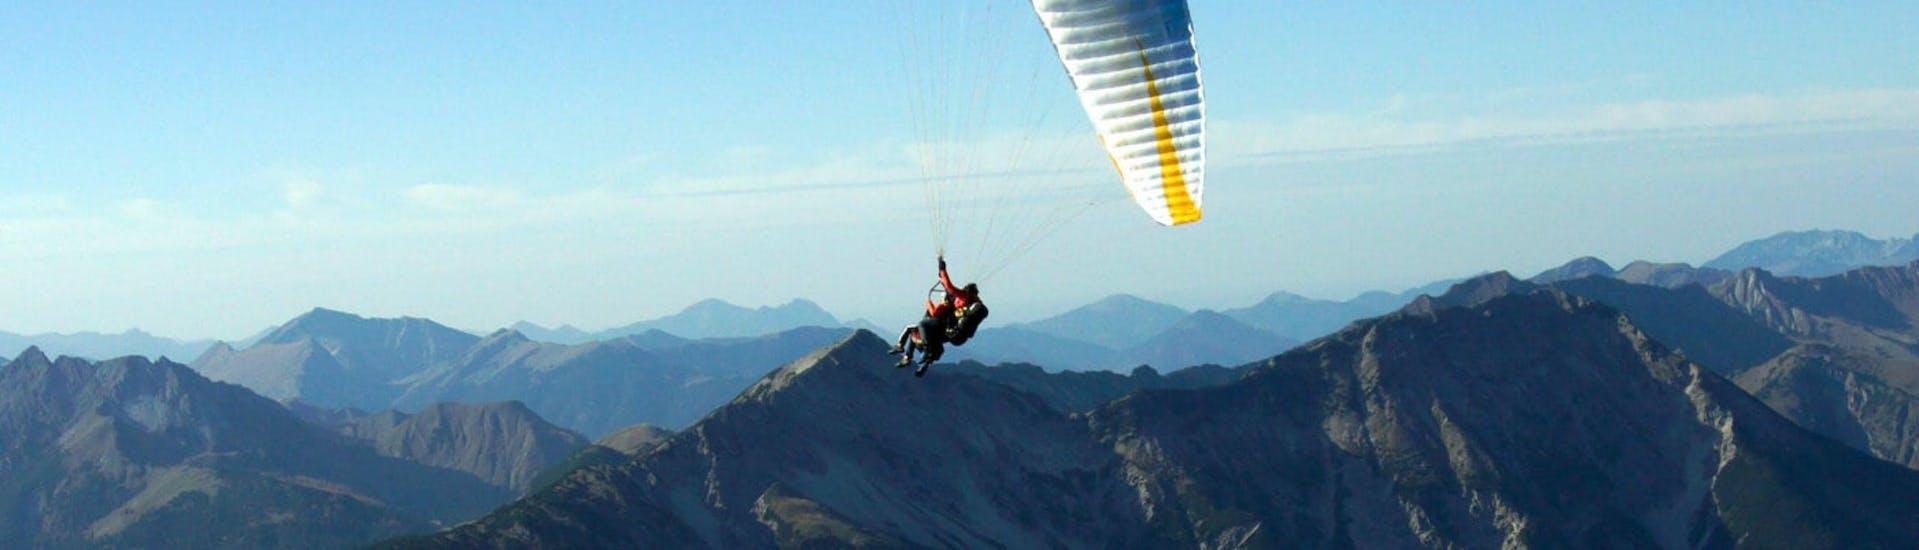 tandem-paragliding-easy-tandem-achensee-hero1